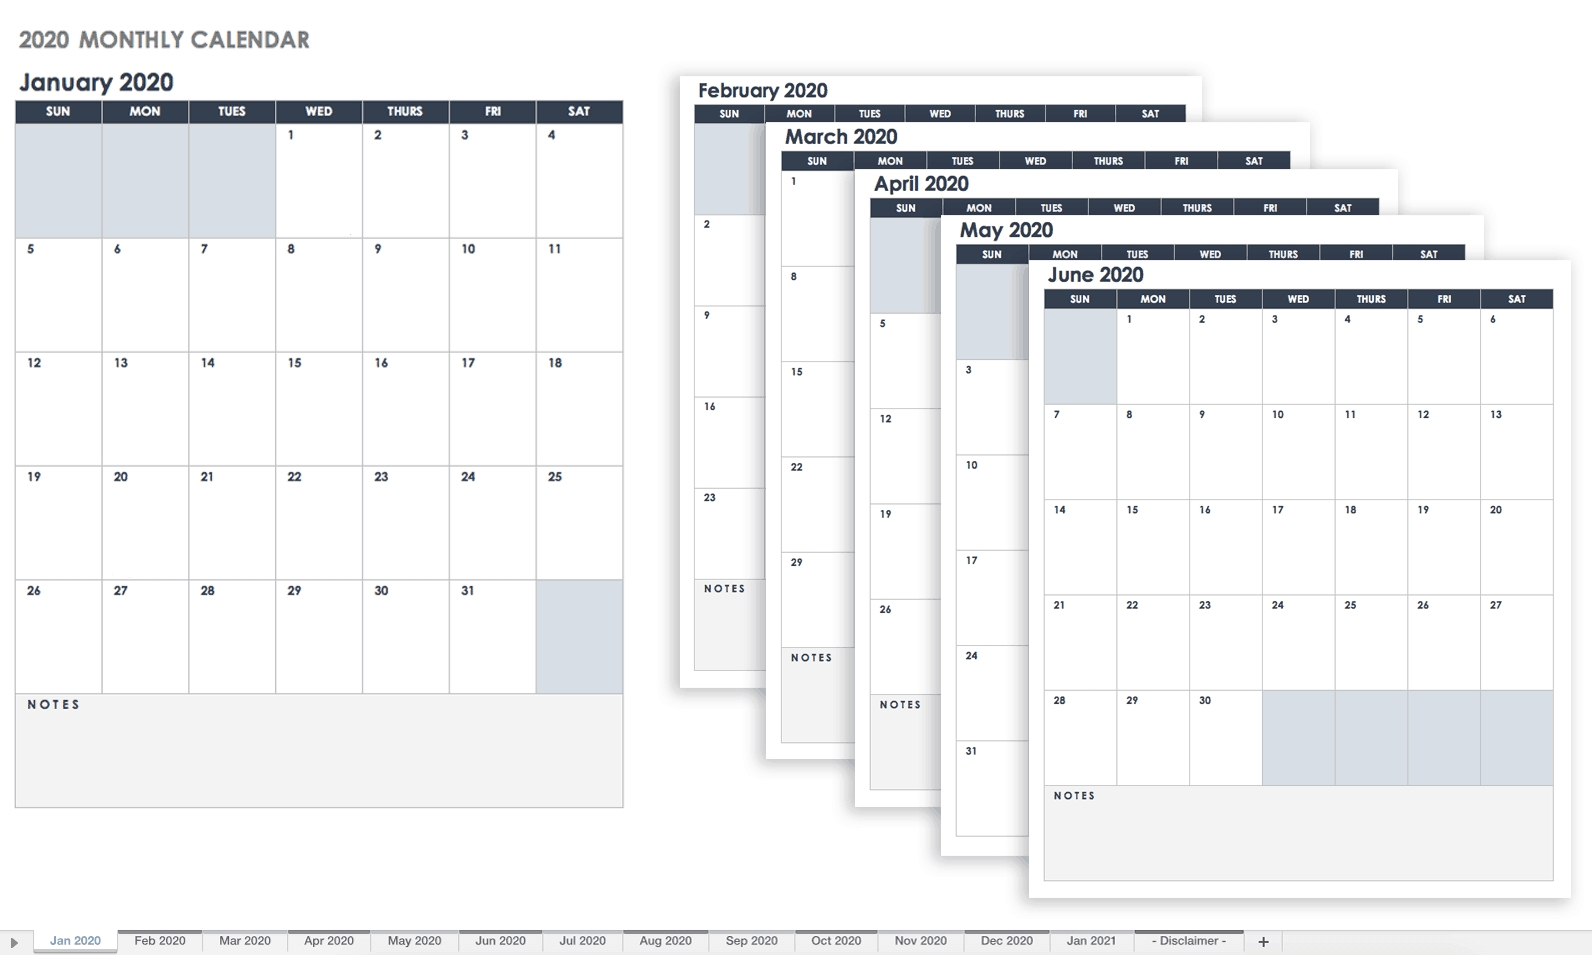 Free Google Calendar Templates | Smartsheet-School Calendar Template Google Sheets